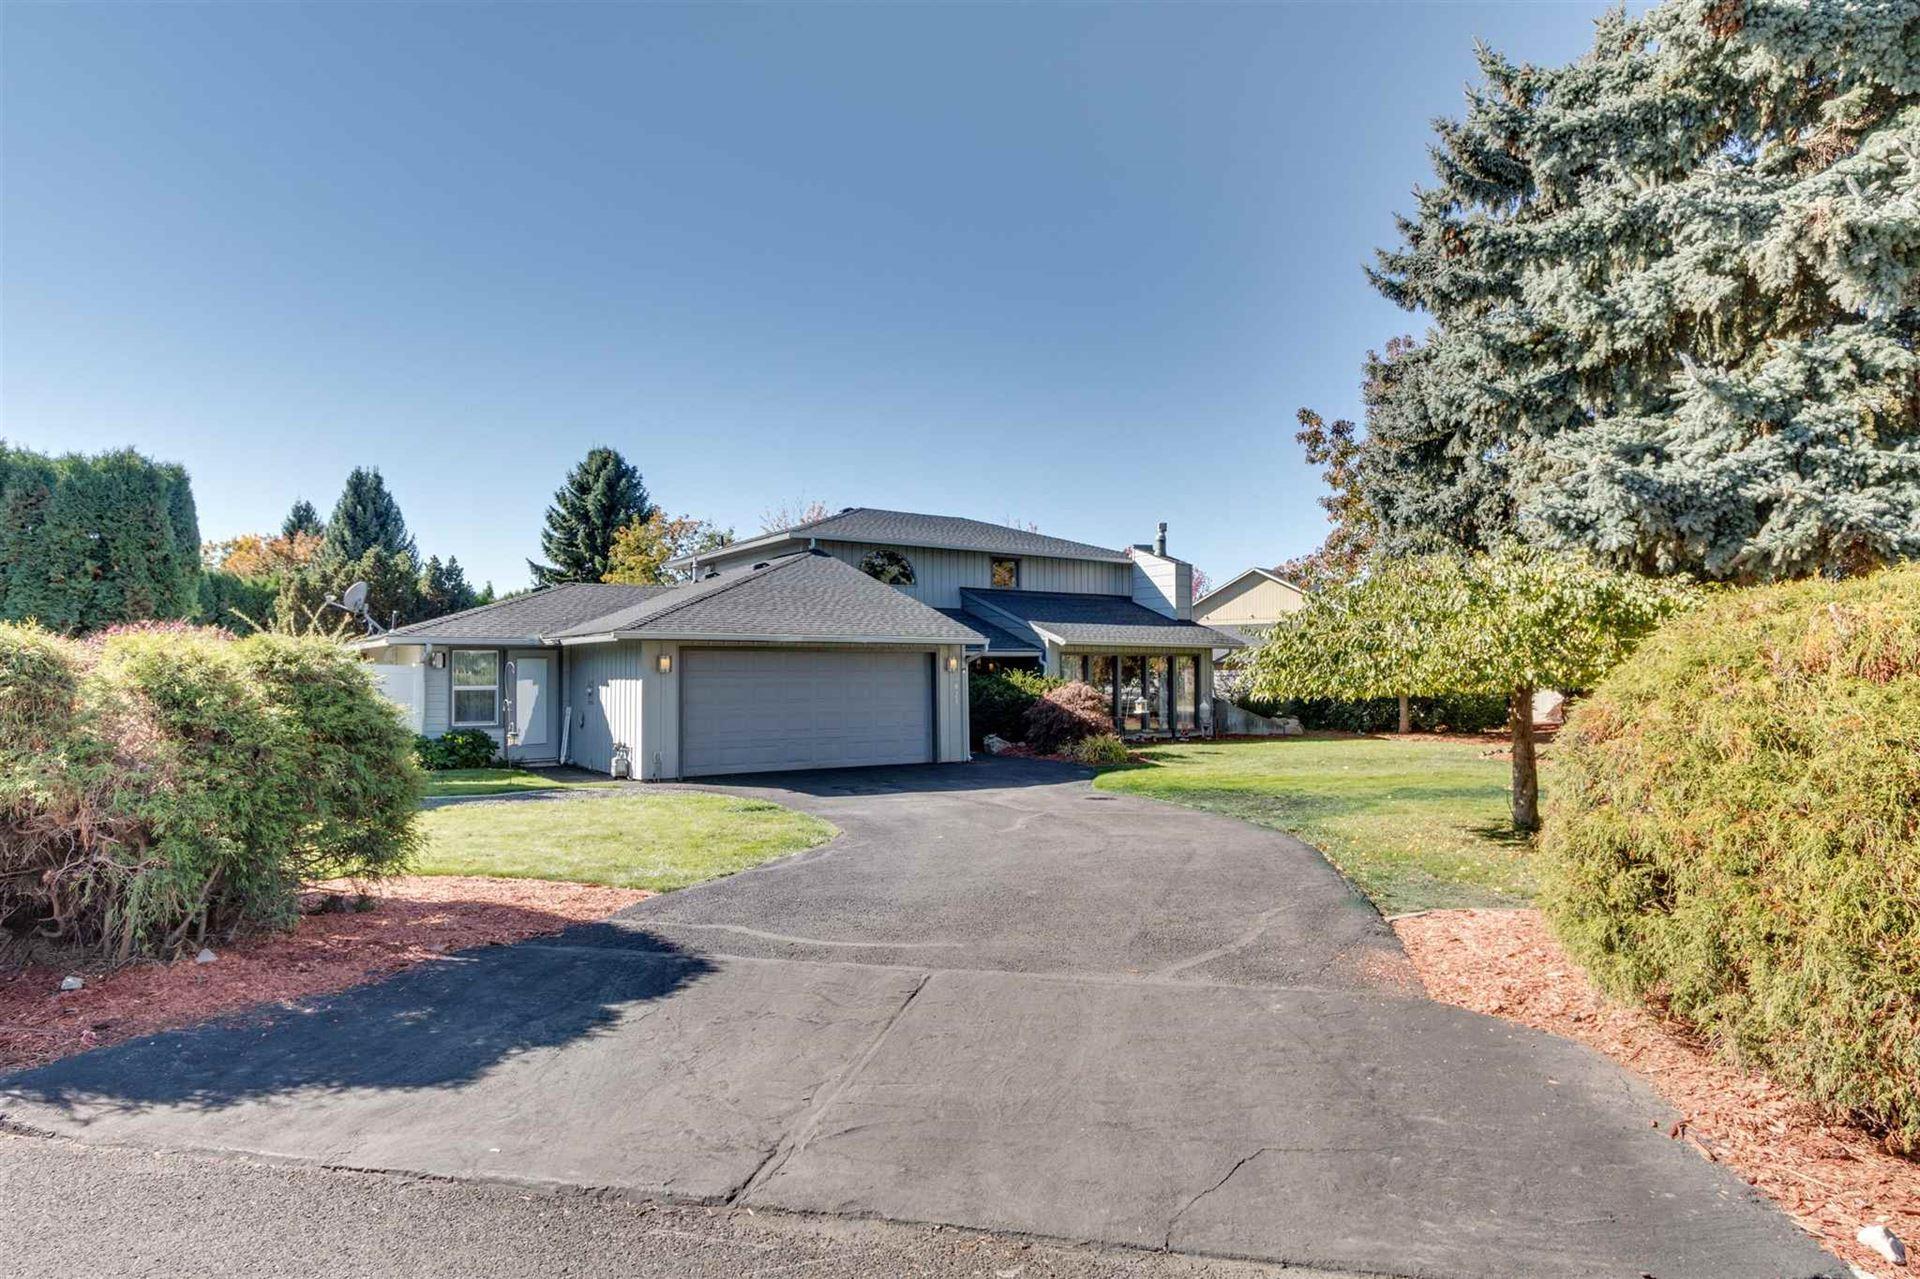 8025 N Maple St, Spokane, WA 99208 - #: 202123751